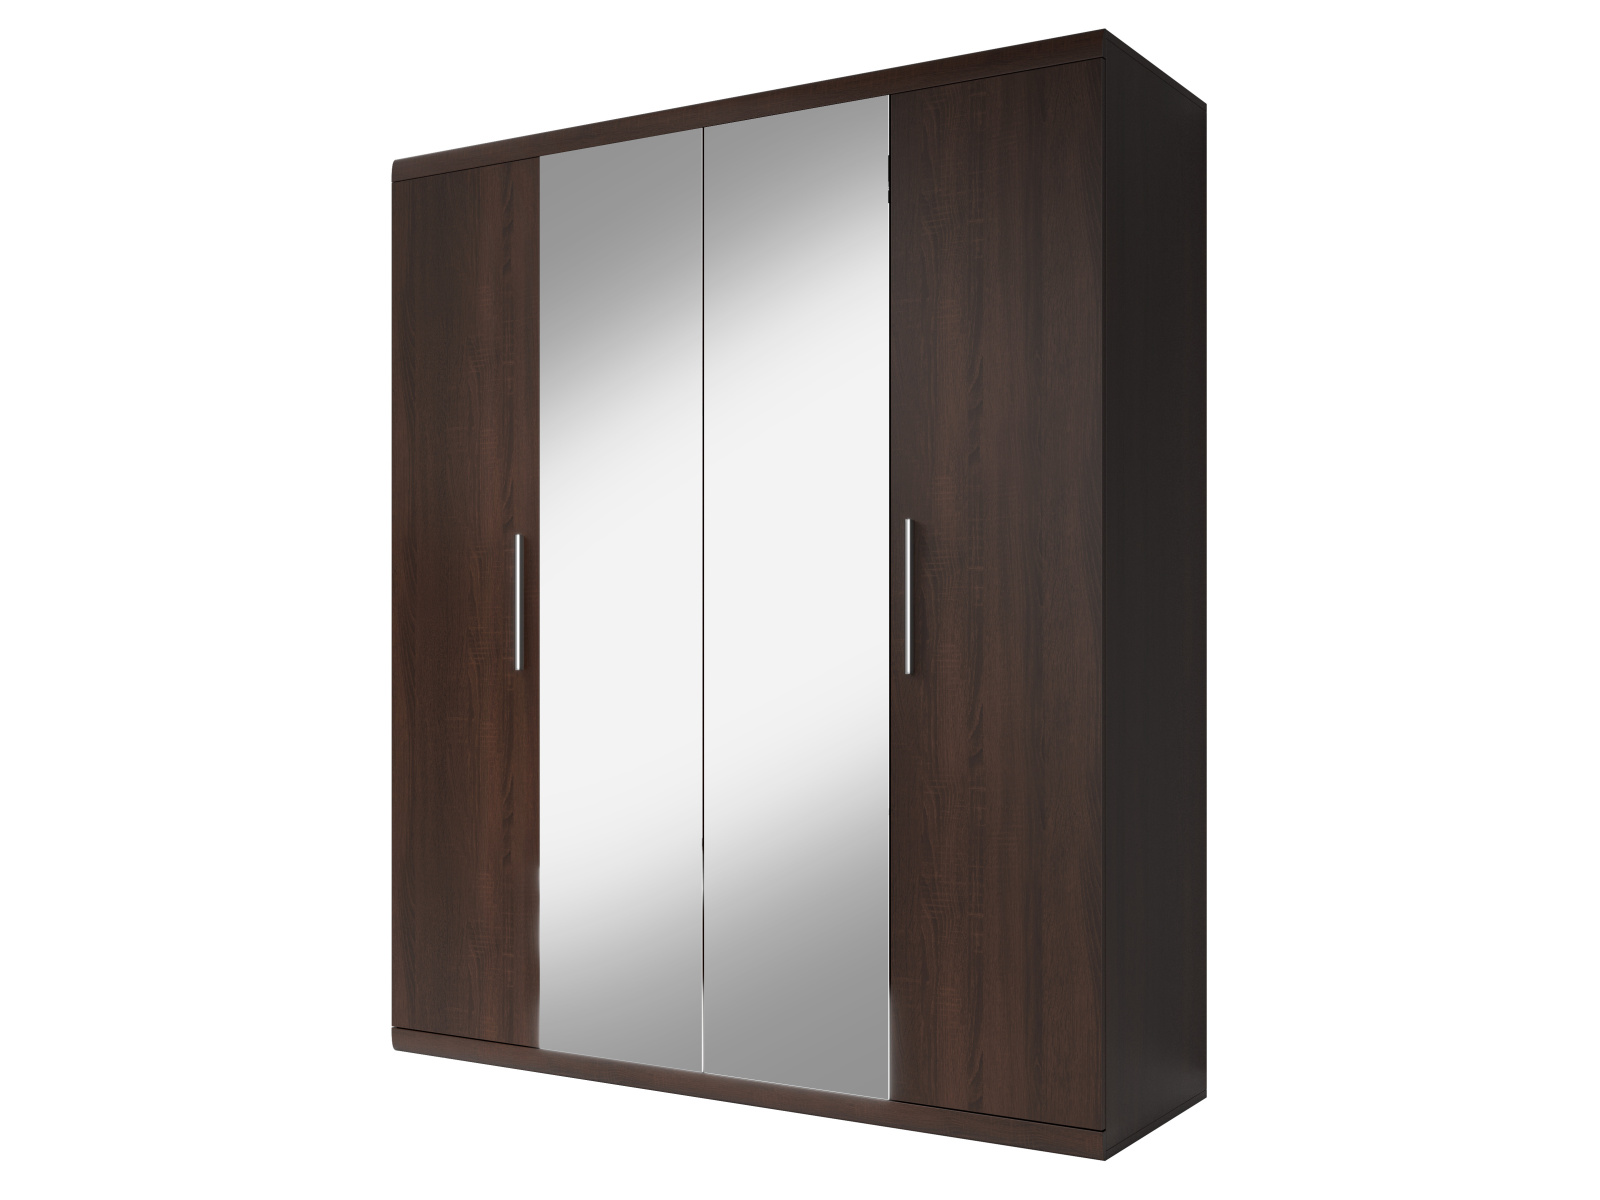 Smartshop MESTRE šatní skříň se zrcadlem 180 TYP 20, dub sonoma tmavý